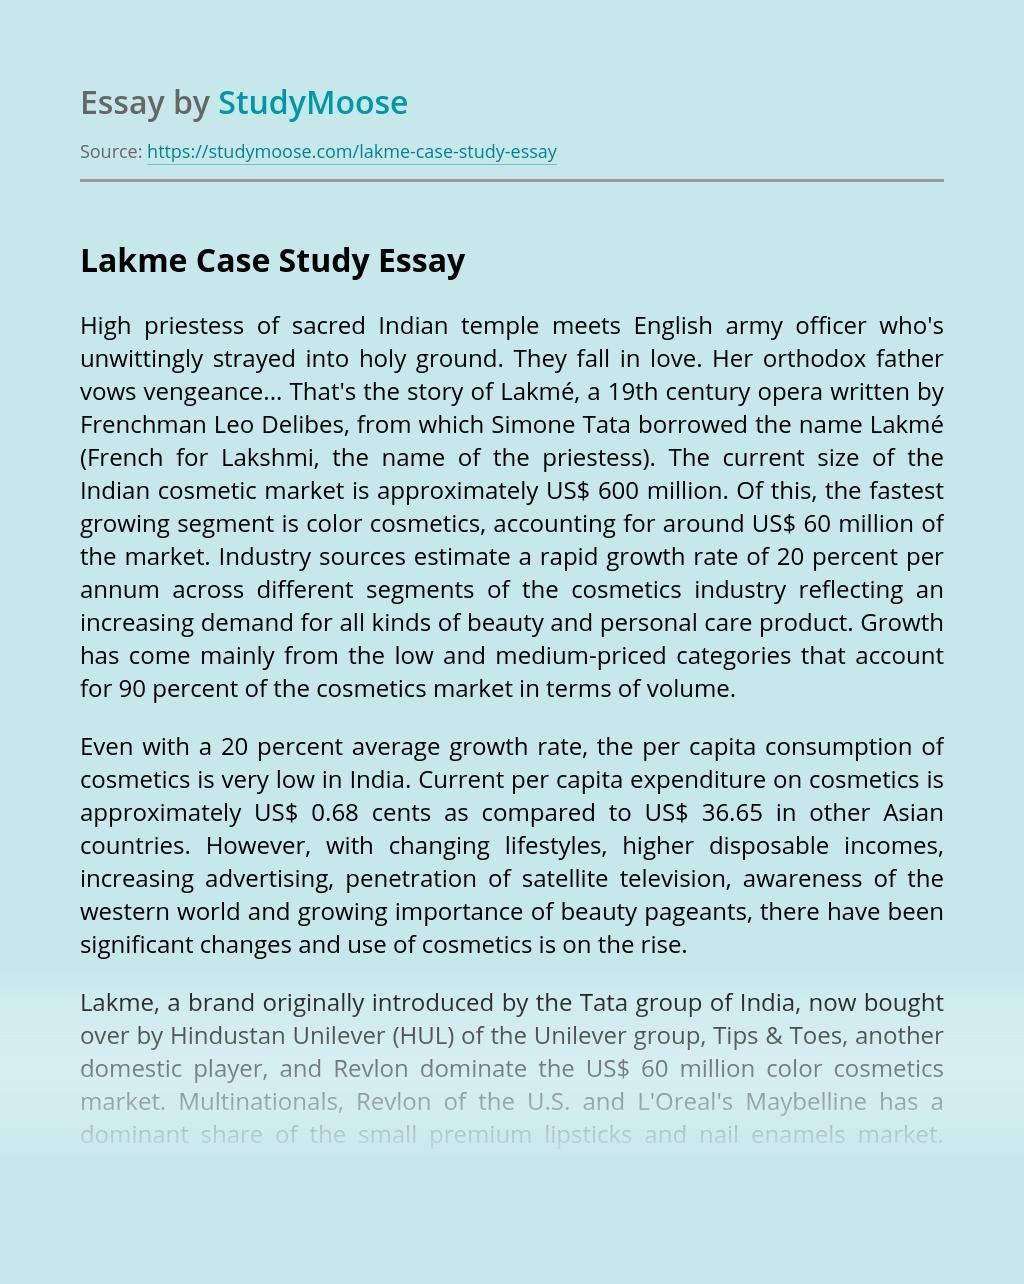 Lakme Case Study